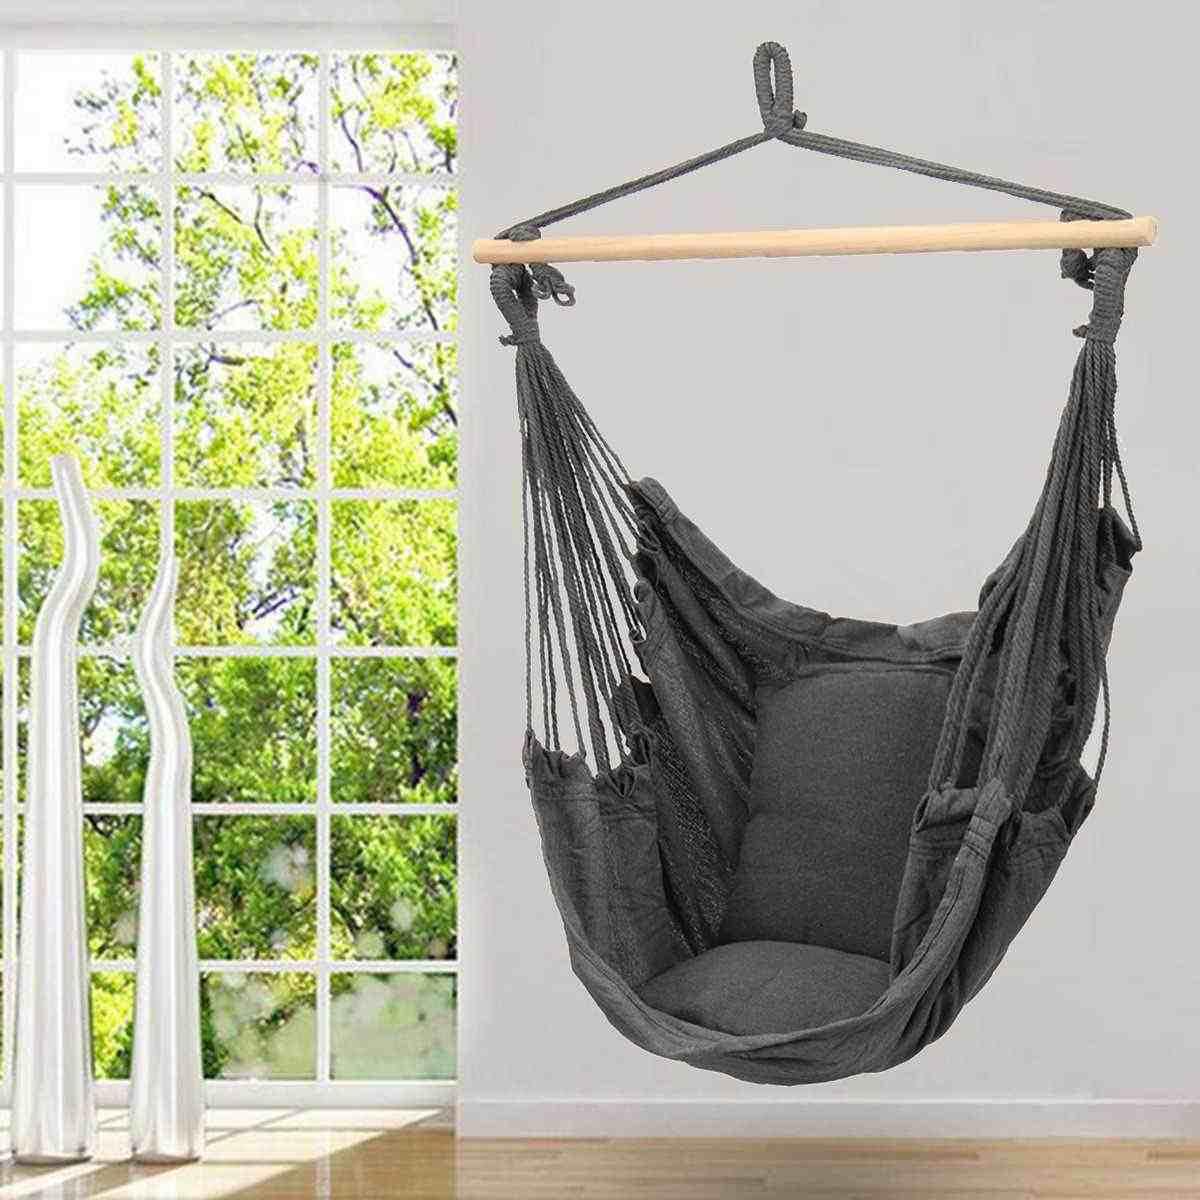 Hanging Hammock Chair Swinging Garden Outdoor Soft Cushions